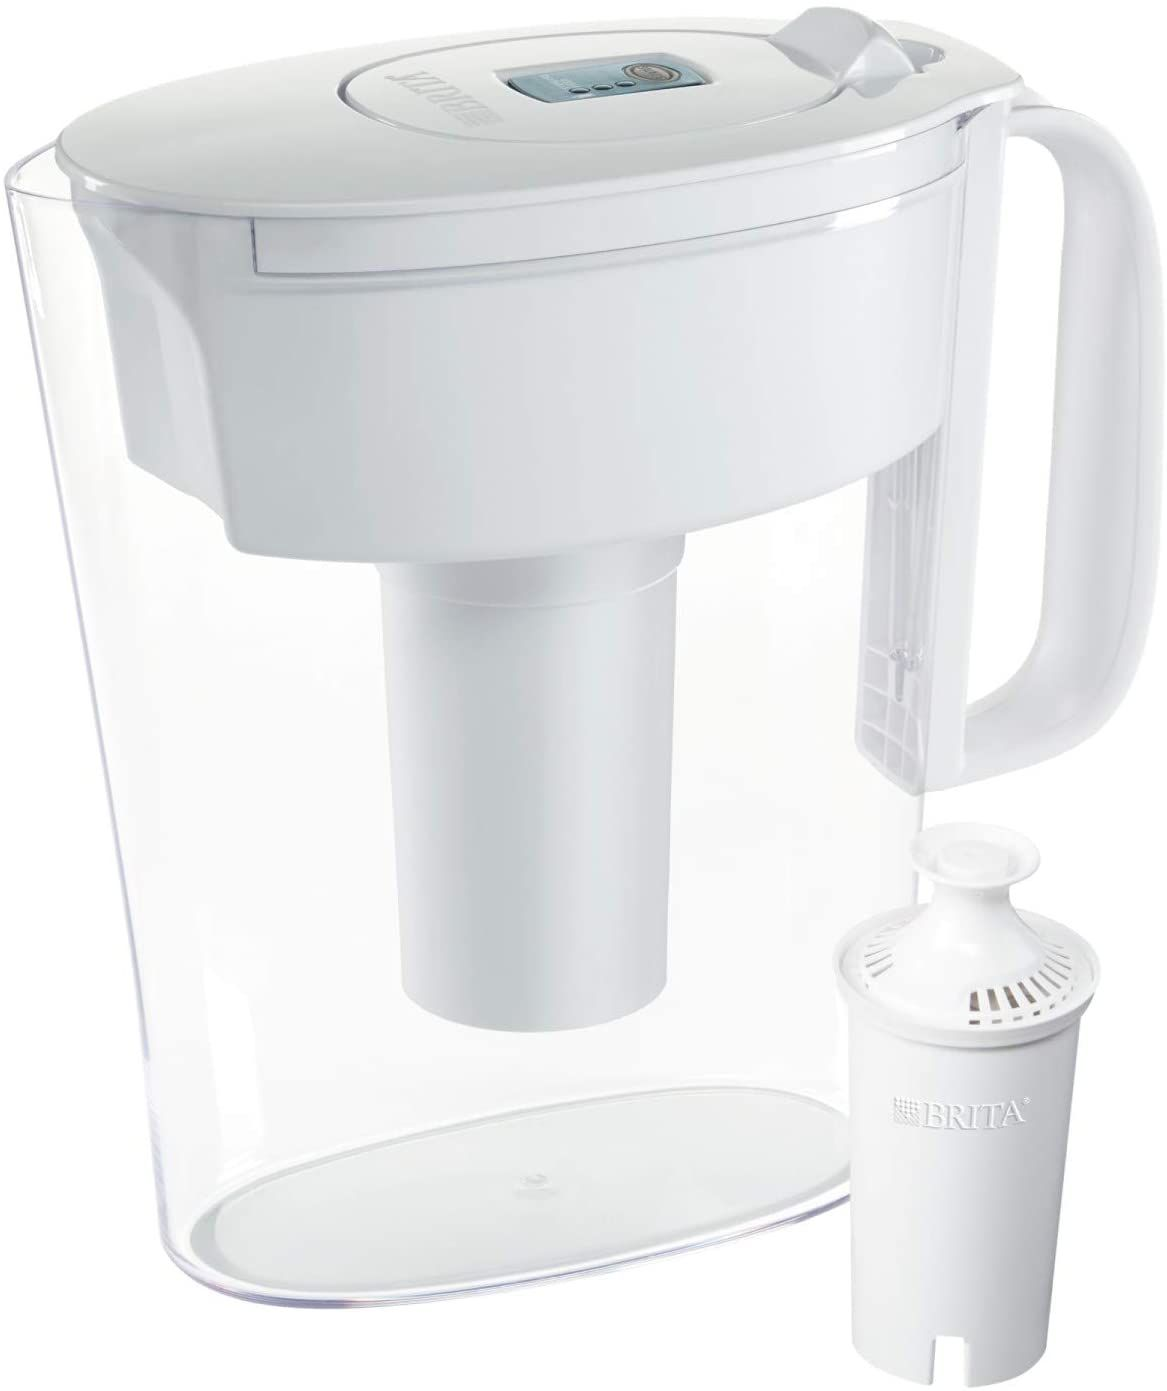 brita-metro-6-cup-water-filter-pitcher